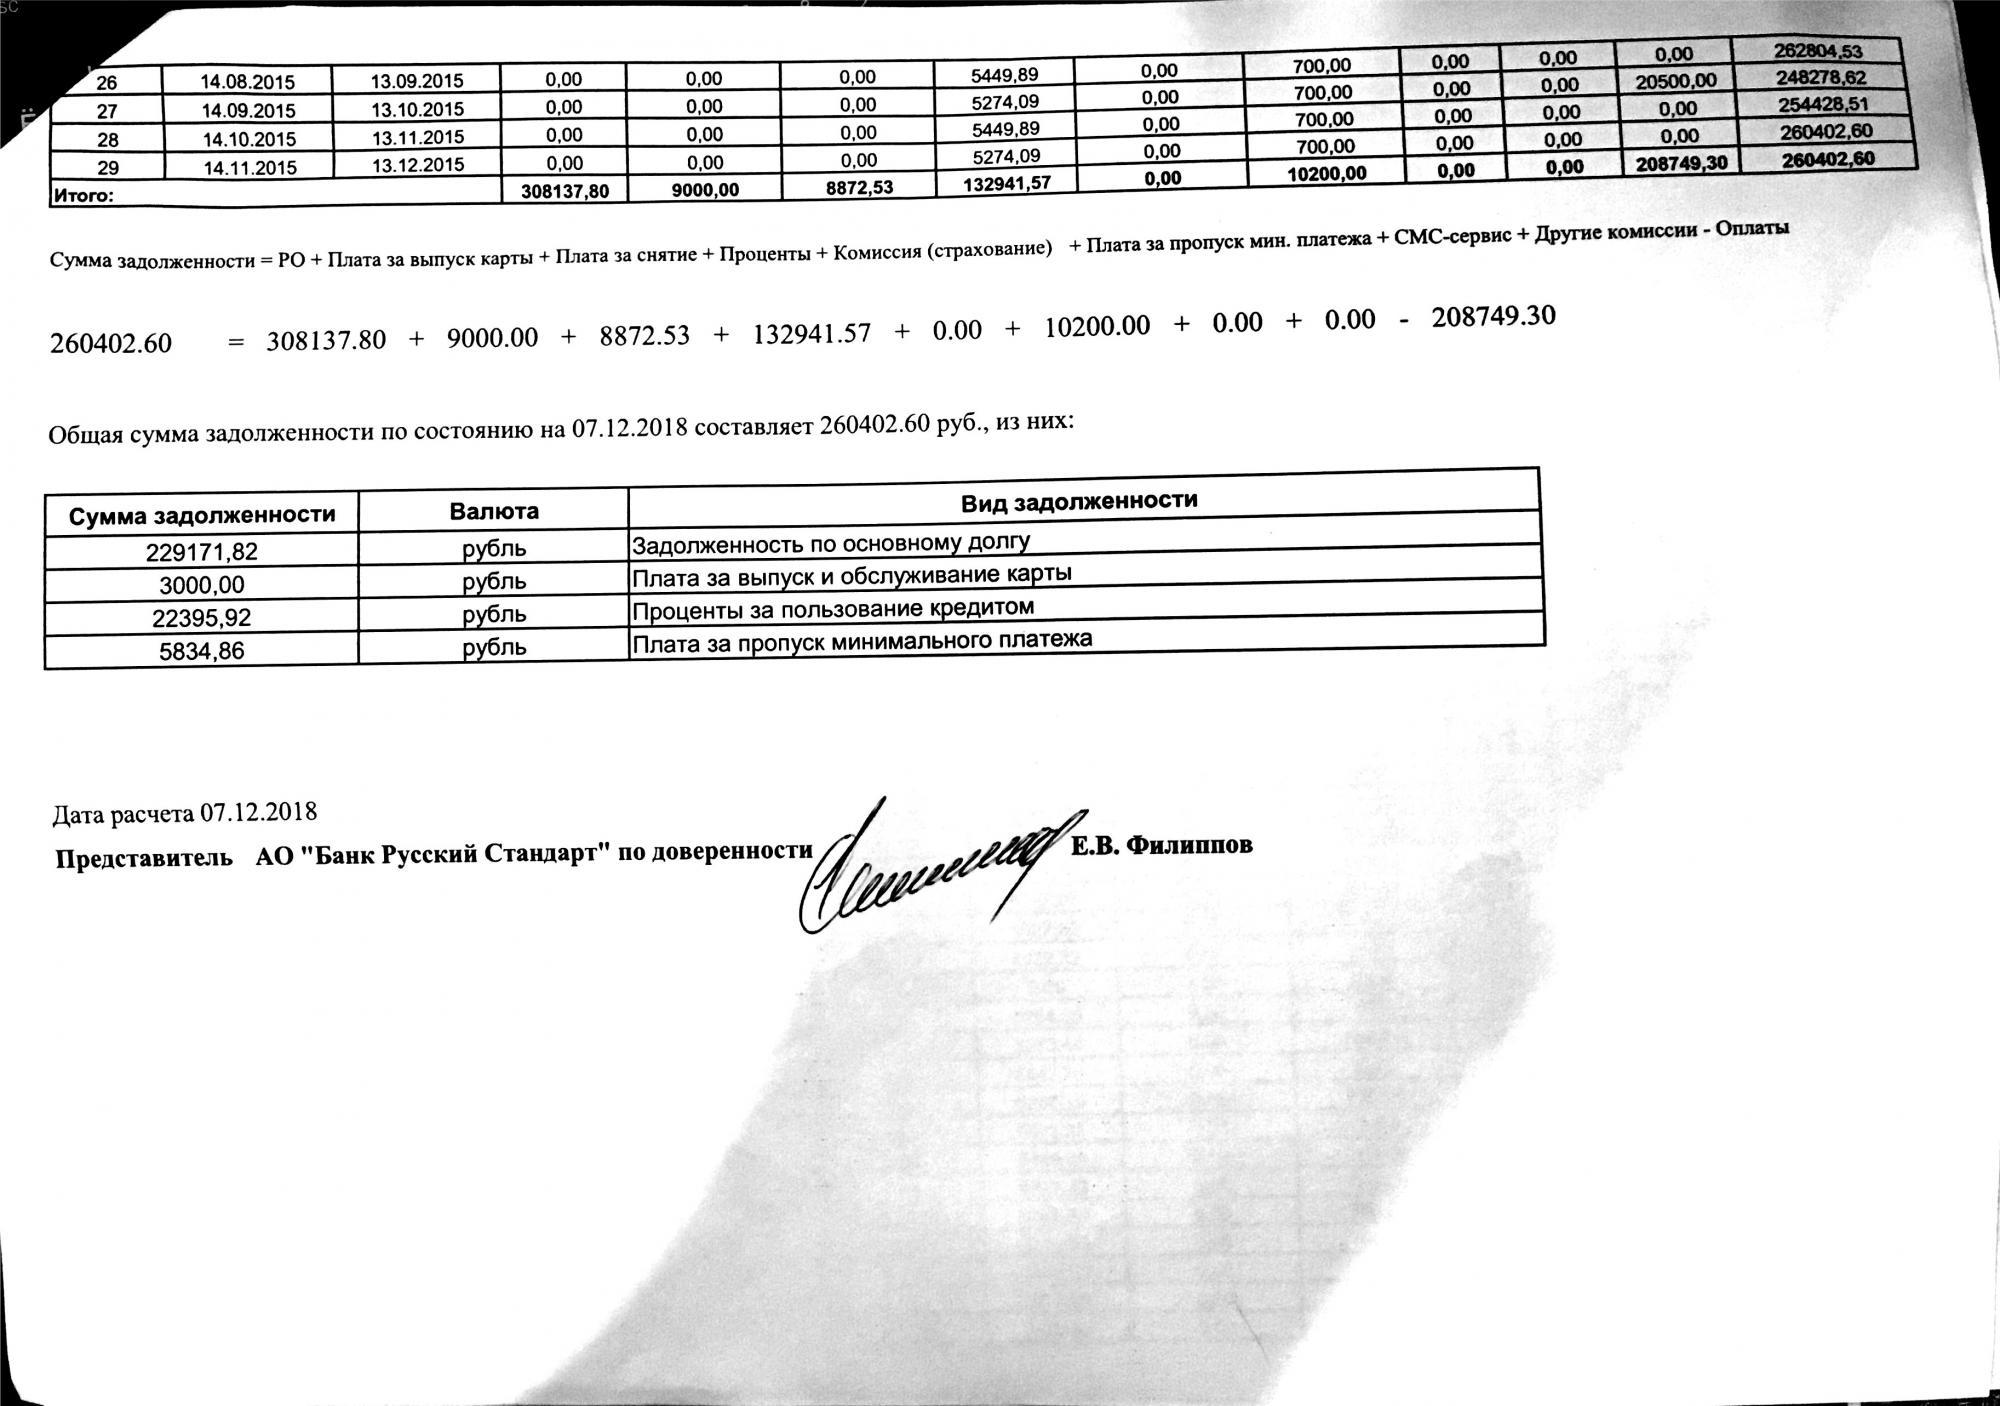 E27334E4-0FFA-4EBE-BFB3-7EDF72C792DE.JPG